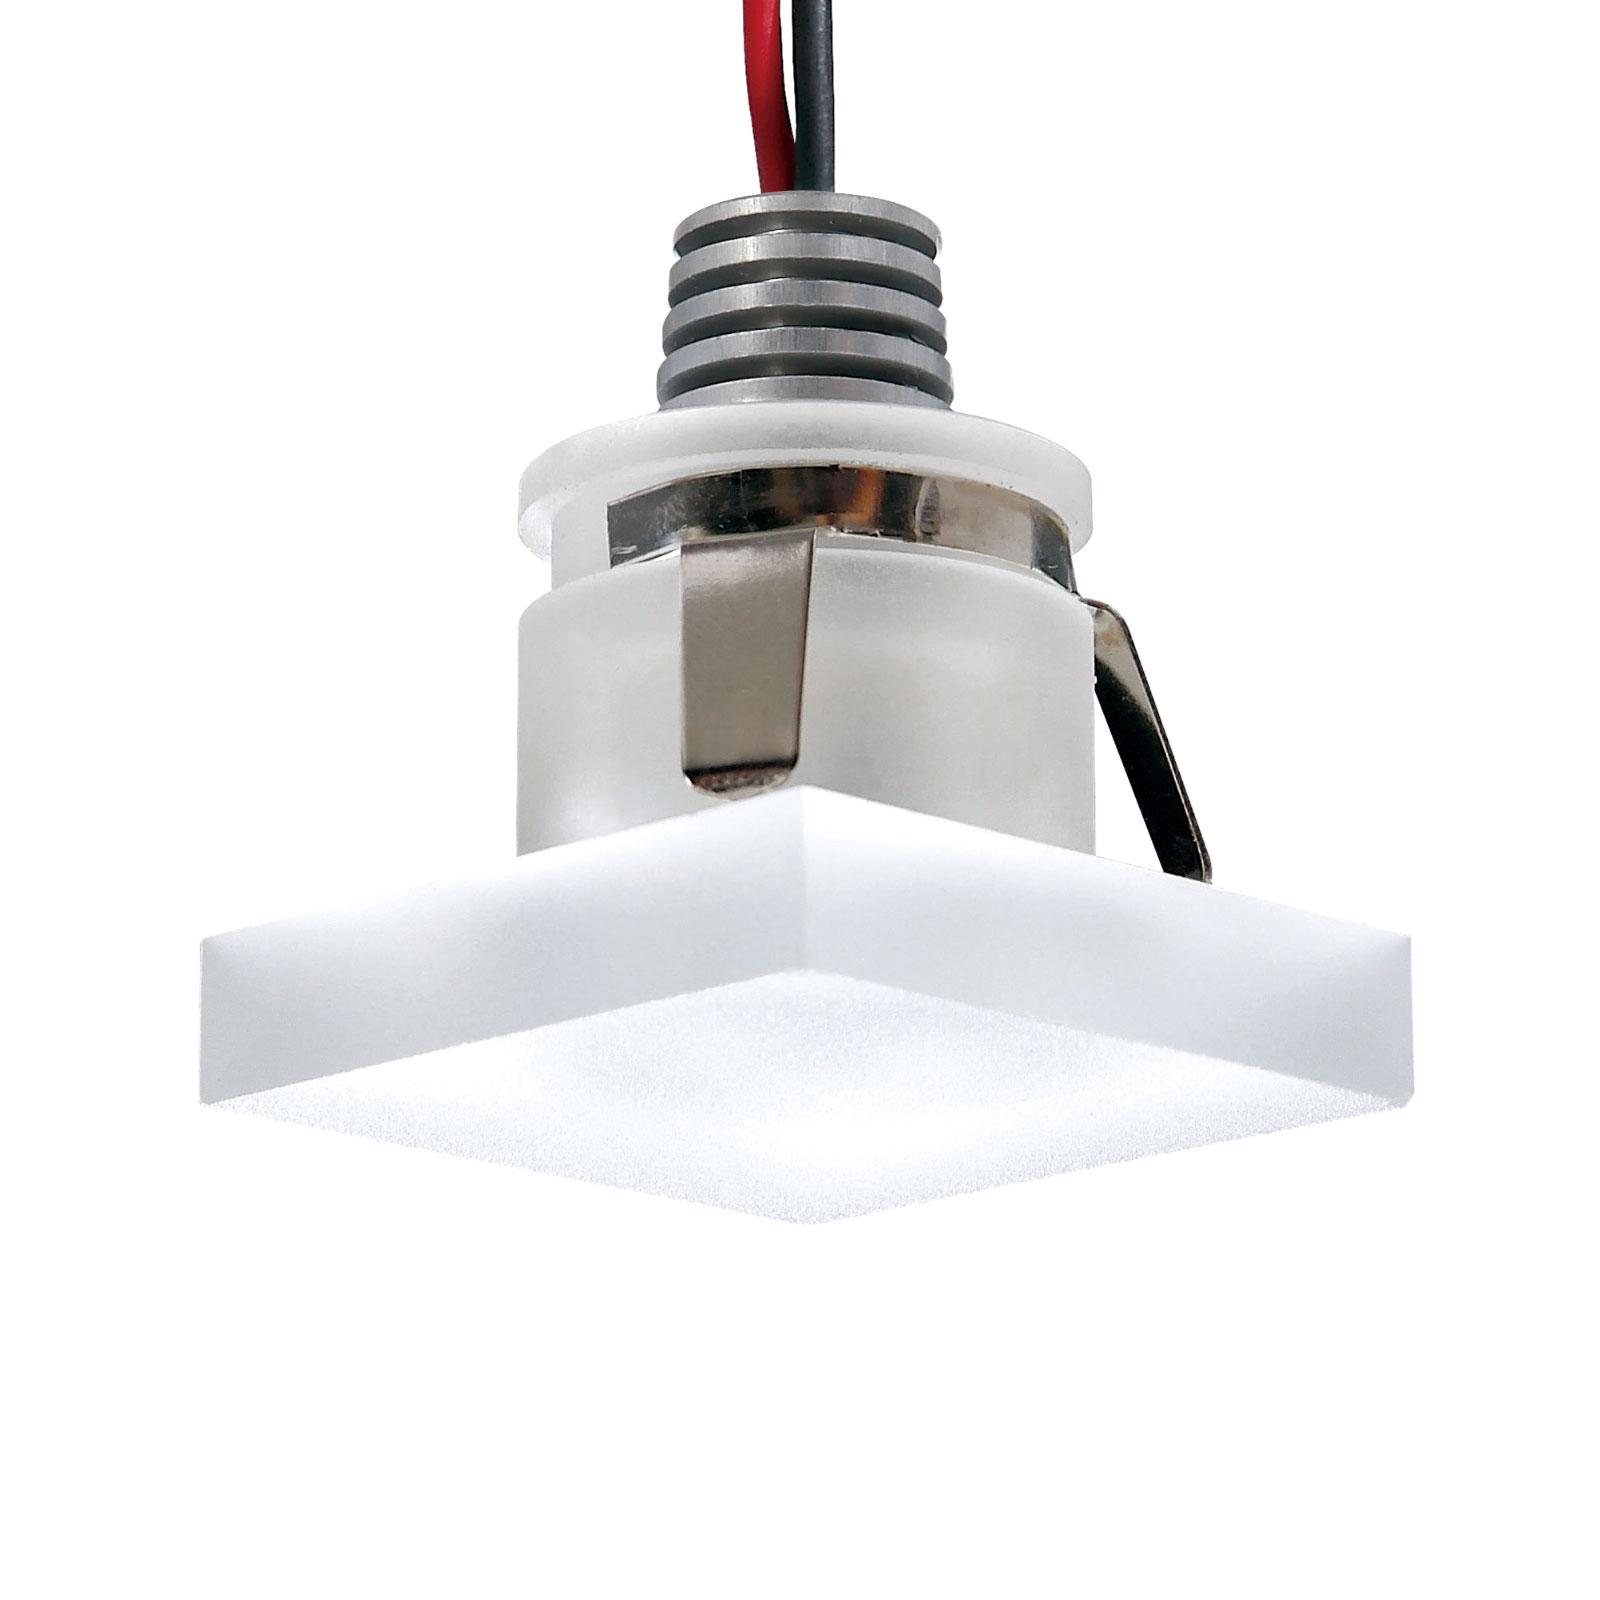 LED-downlight Cristalin, kantet, IP44